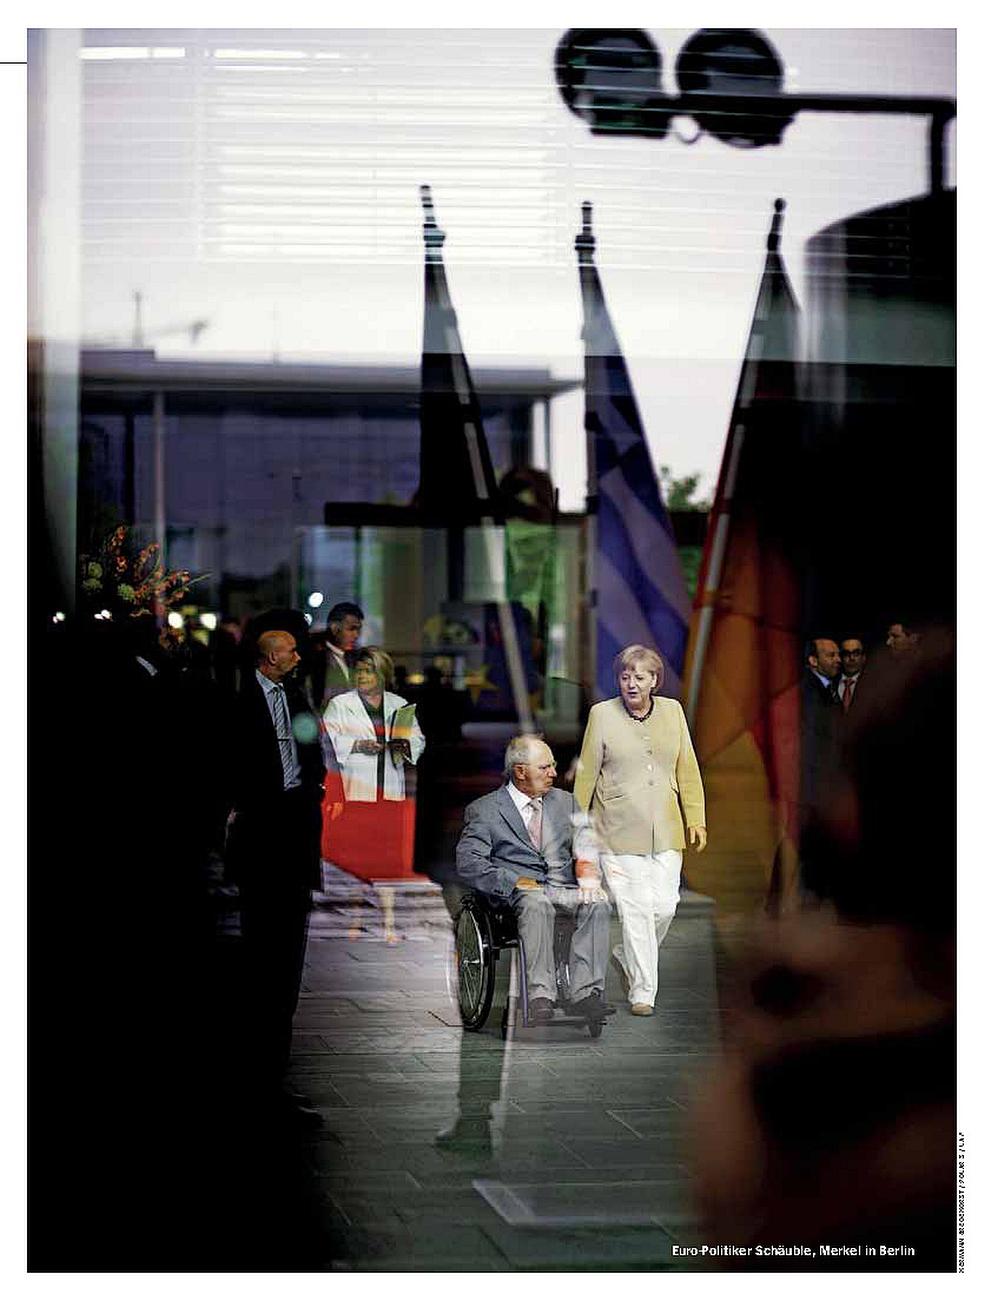 SPIEGEL, Germany, 26.08.2013, German Chancellor Angela Merkel and German Minister of Finance Wolfgang Schaeuble